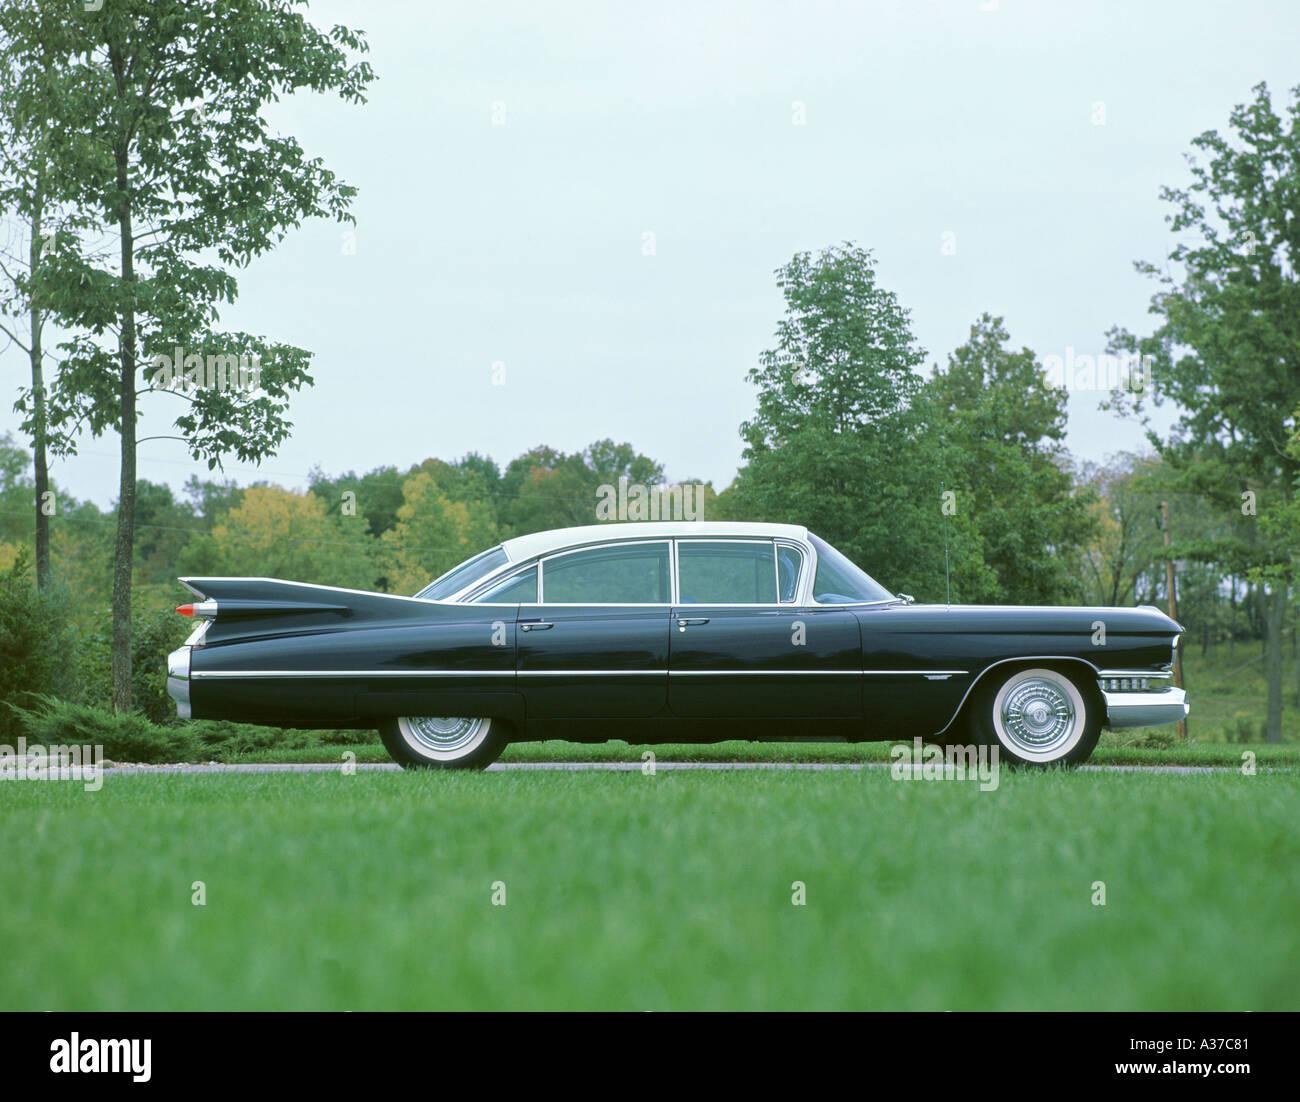 1959 Cadillac 60s Imagen De Stock